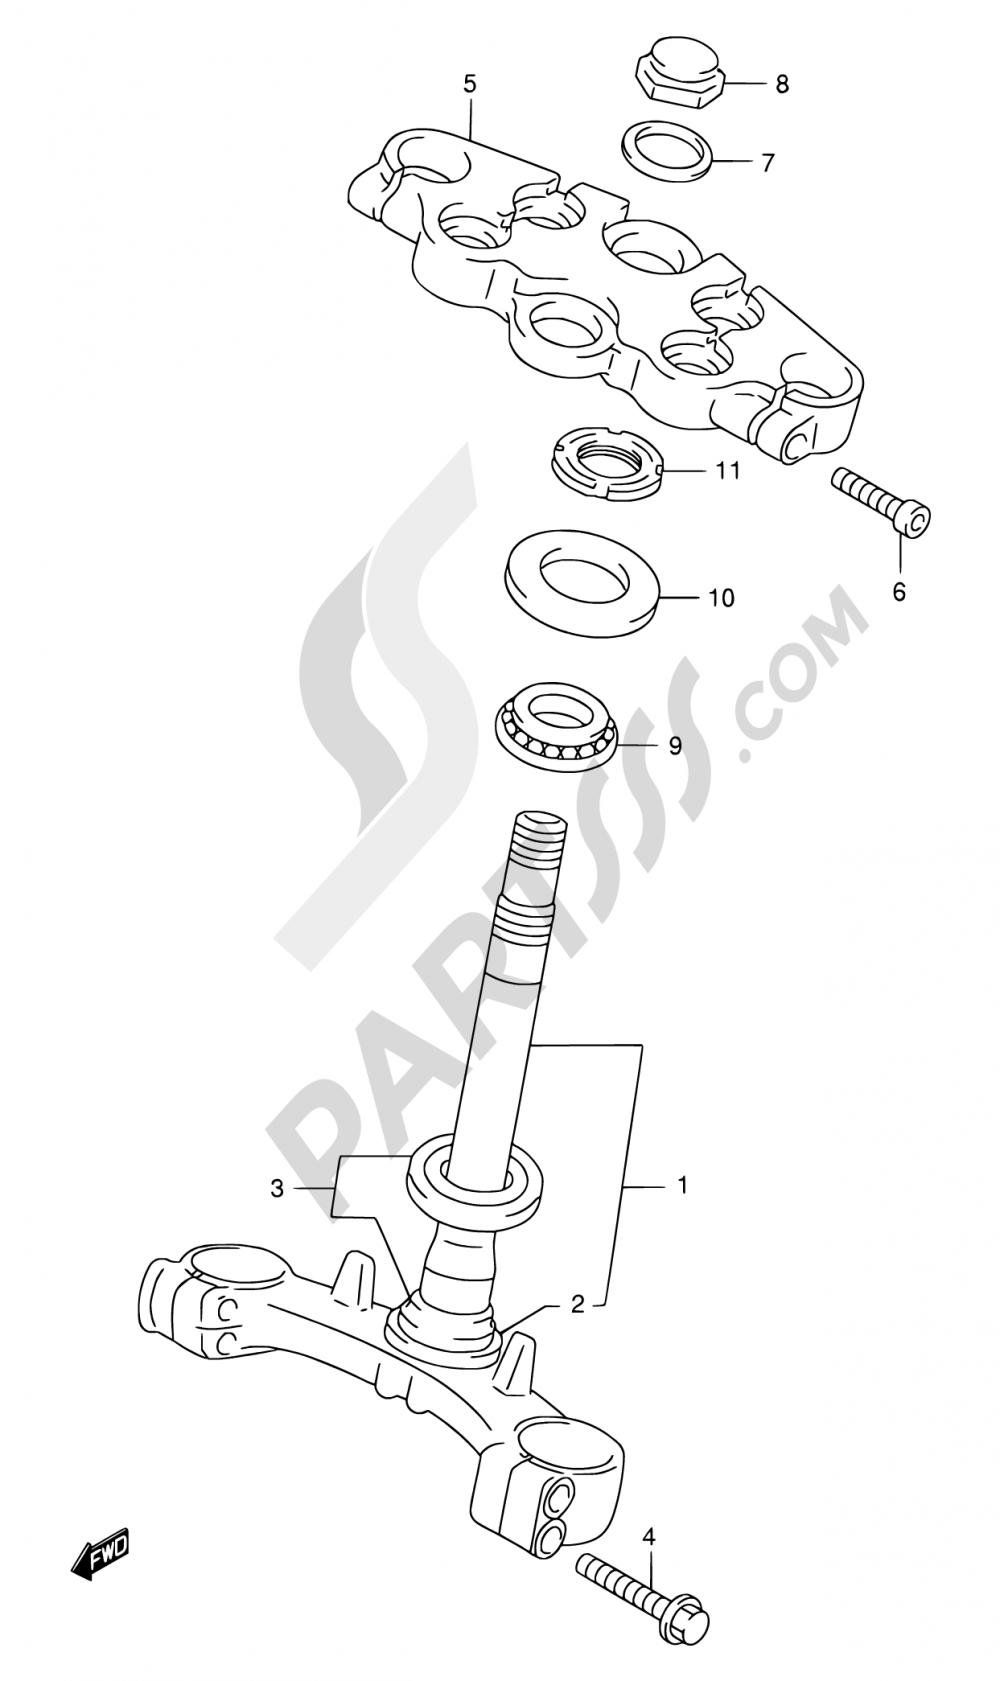 47 - STEERING STEM (MODEL W/X/Y/K1/K2) Suzuki GSX750F 2001